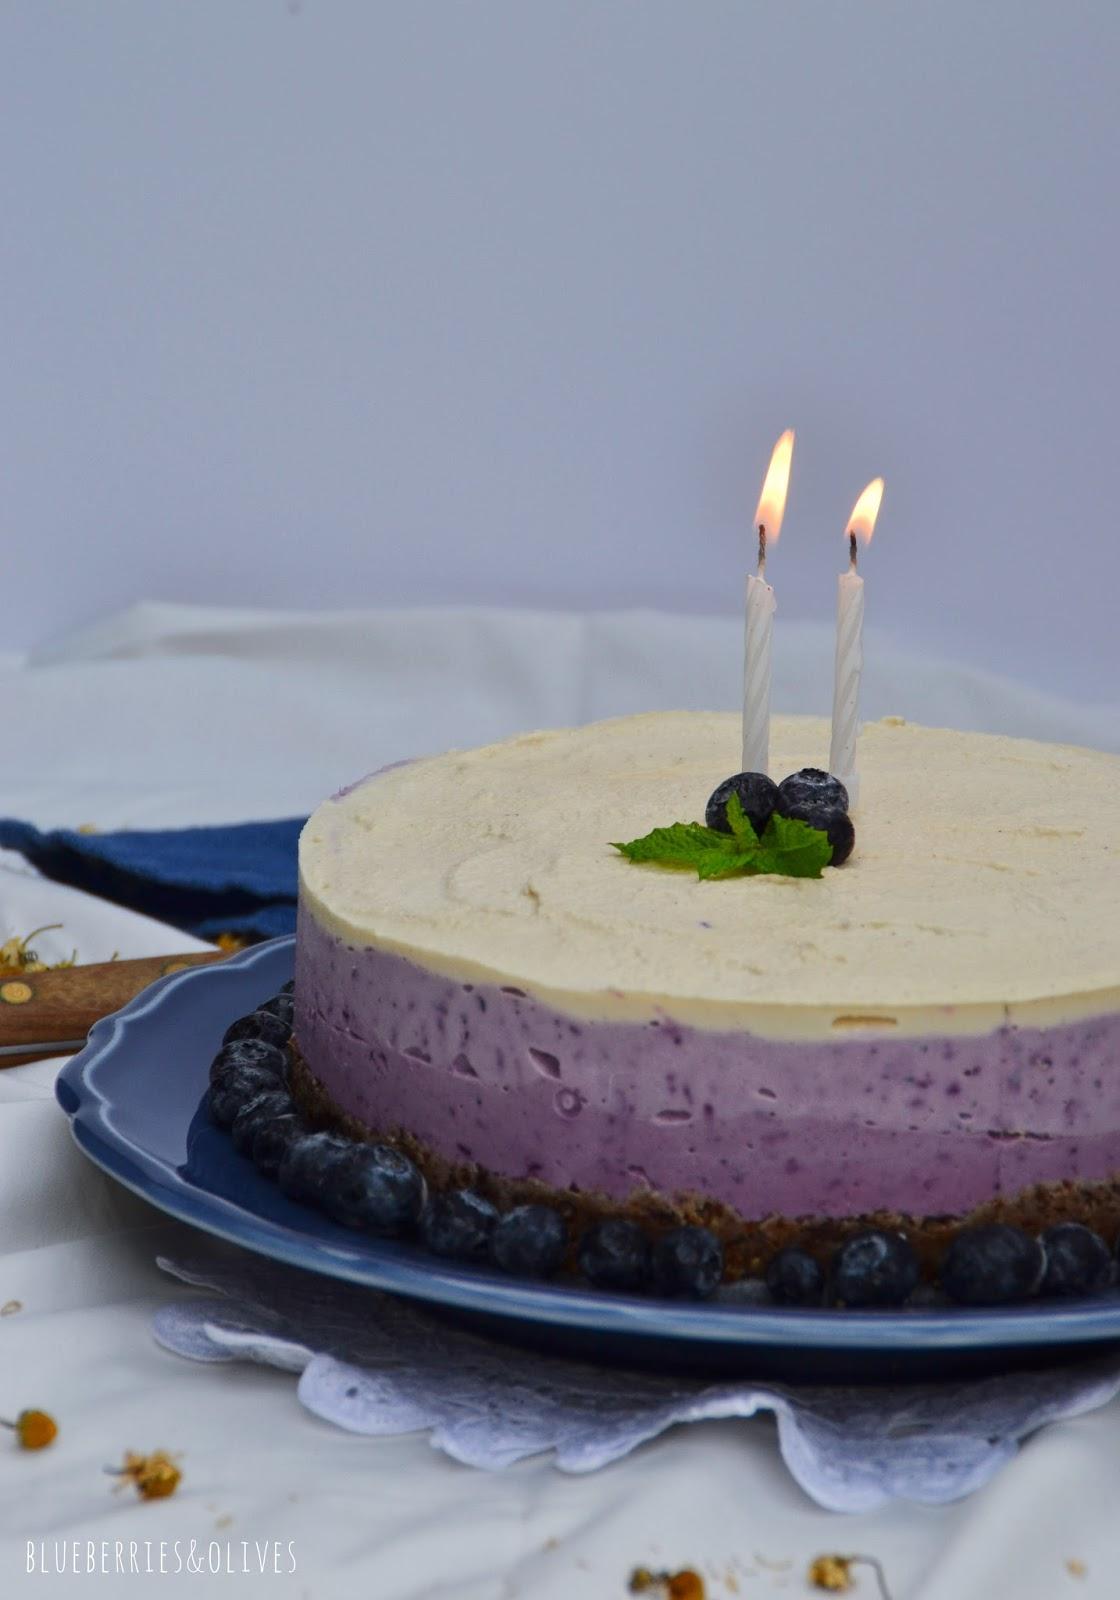 BLUEBERRY FROZEN CAKE